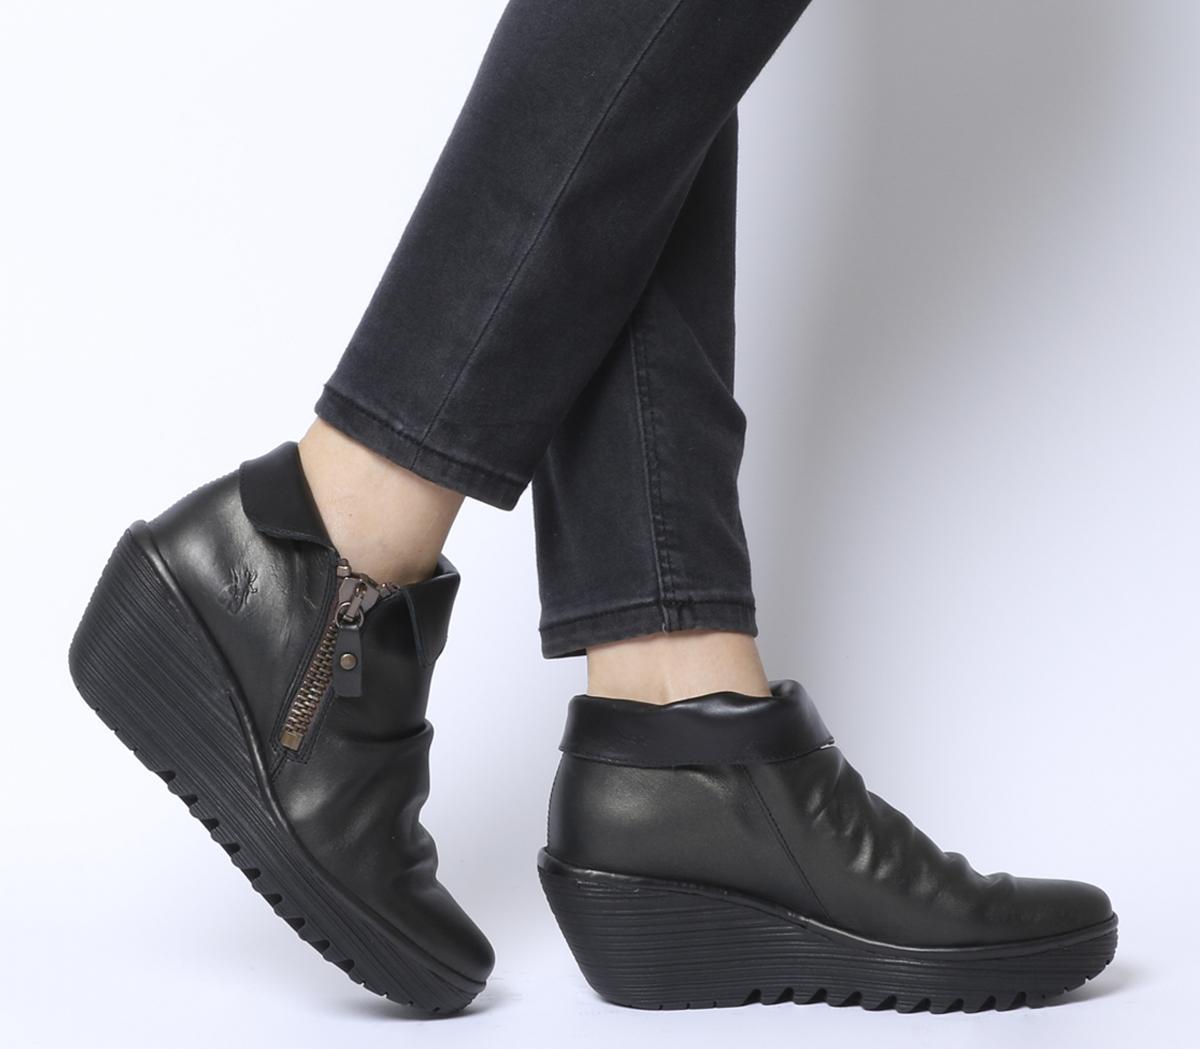 Yoxi Zip Boots